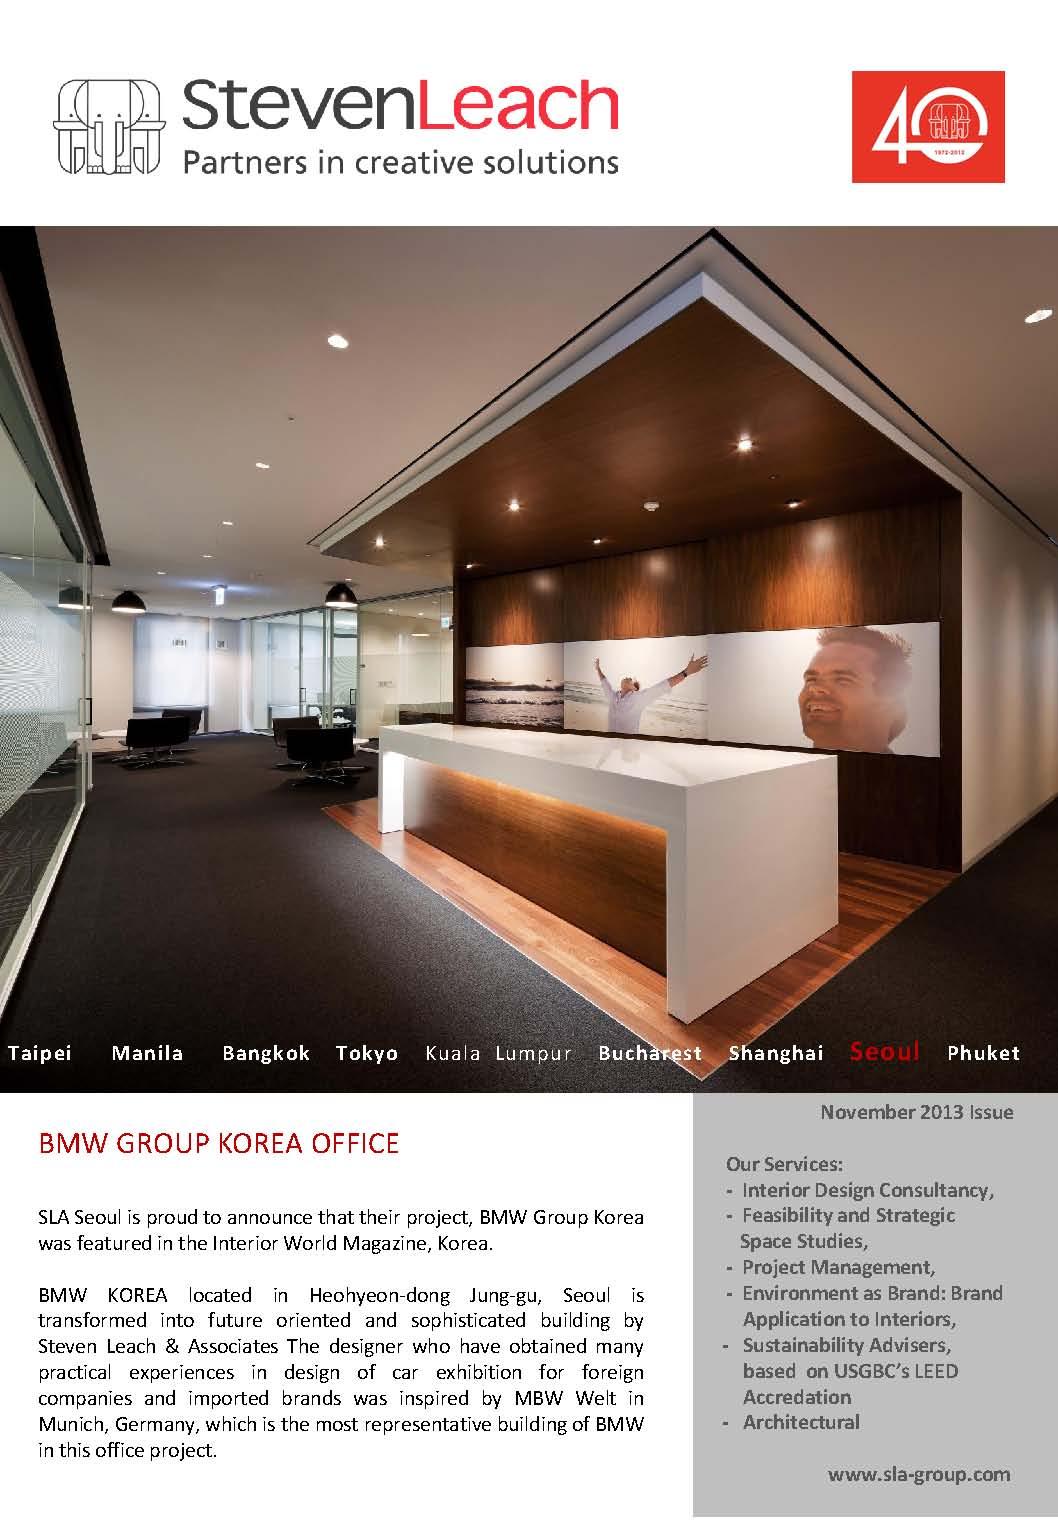 BMW Group Korea office